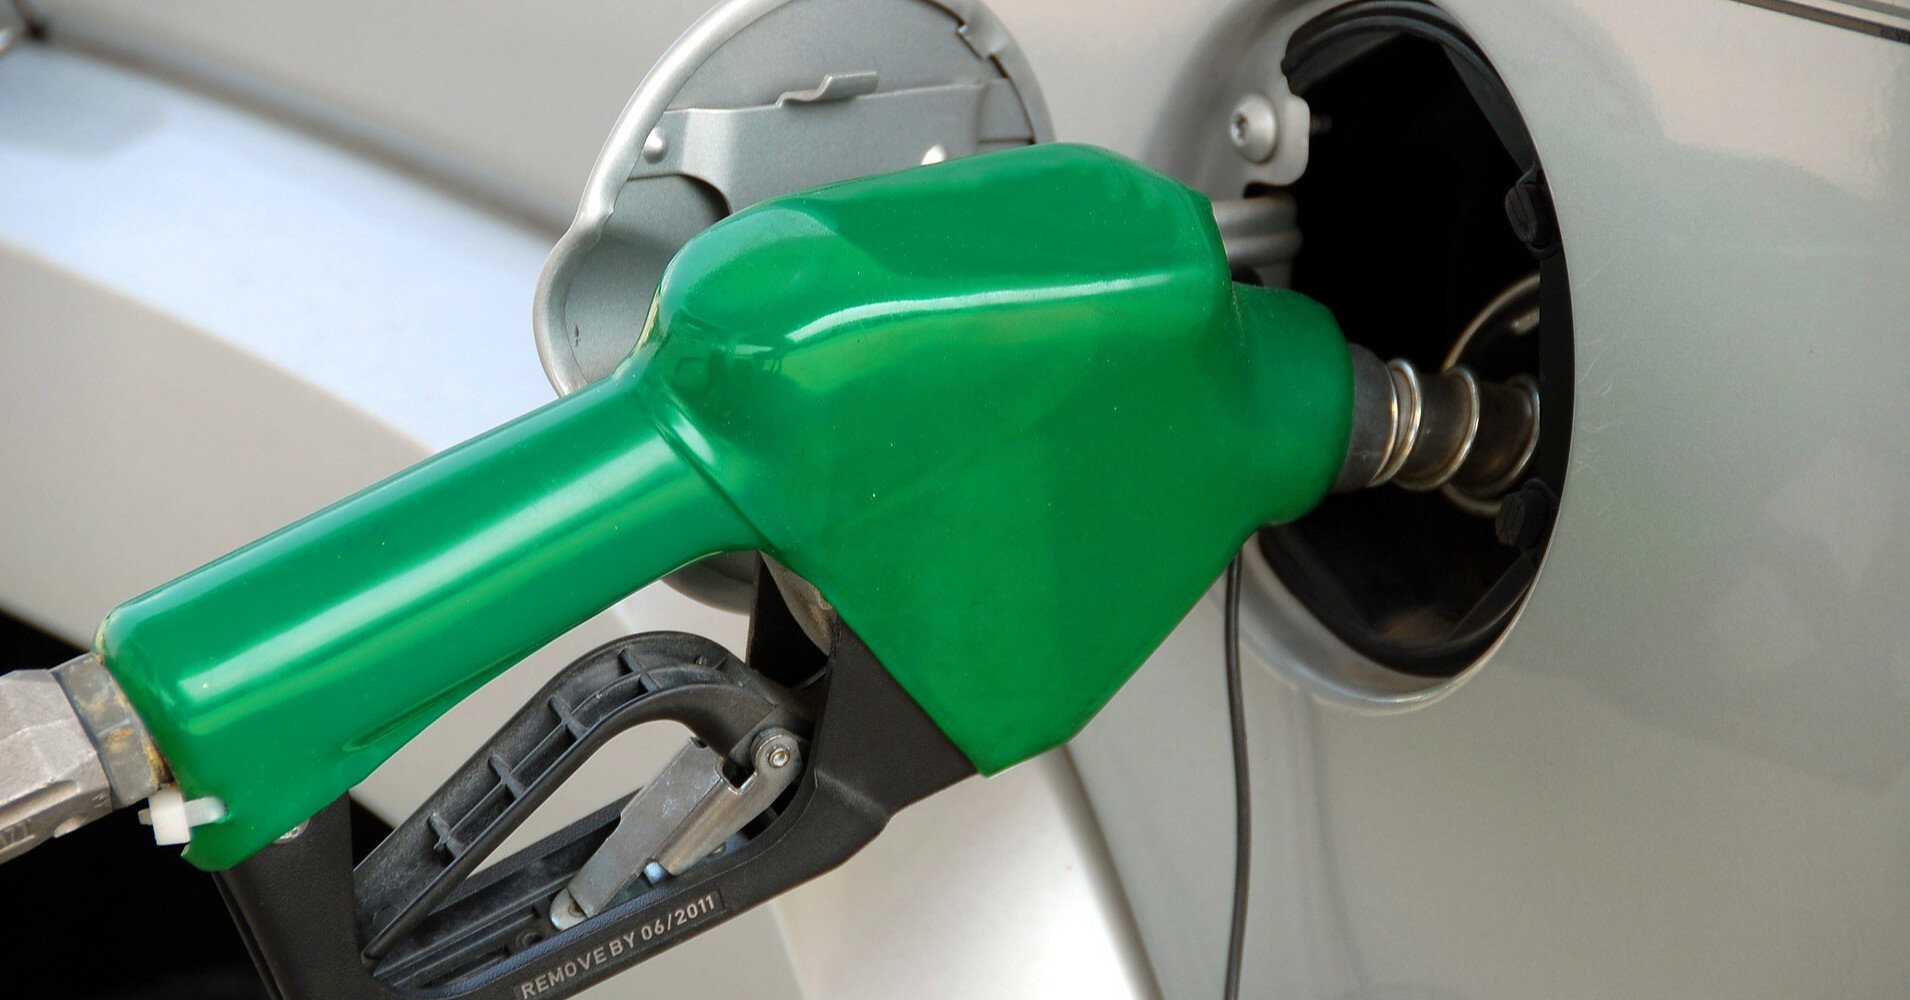 Цена бензина взлетит почти на 6 грн: прогноз экспертов